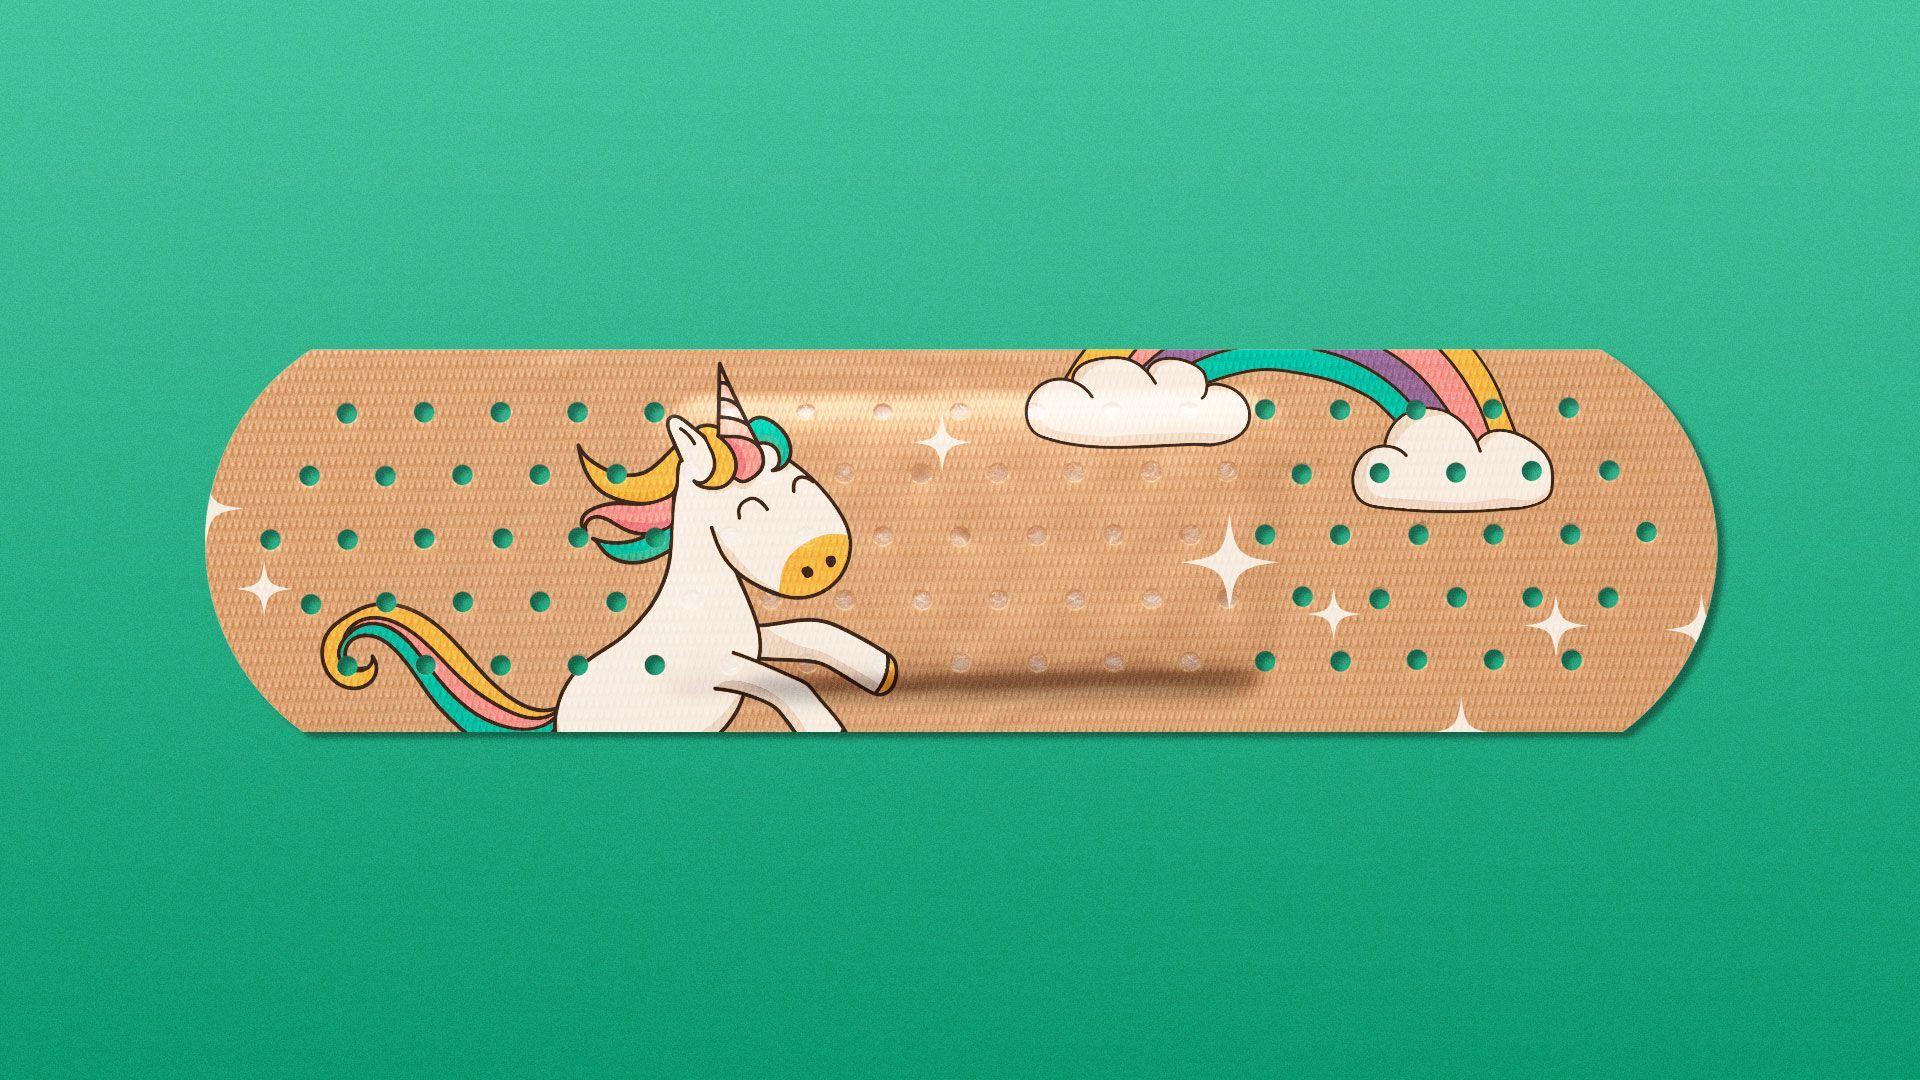 Illustration of bandage with a children's unicorn pattern